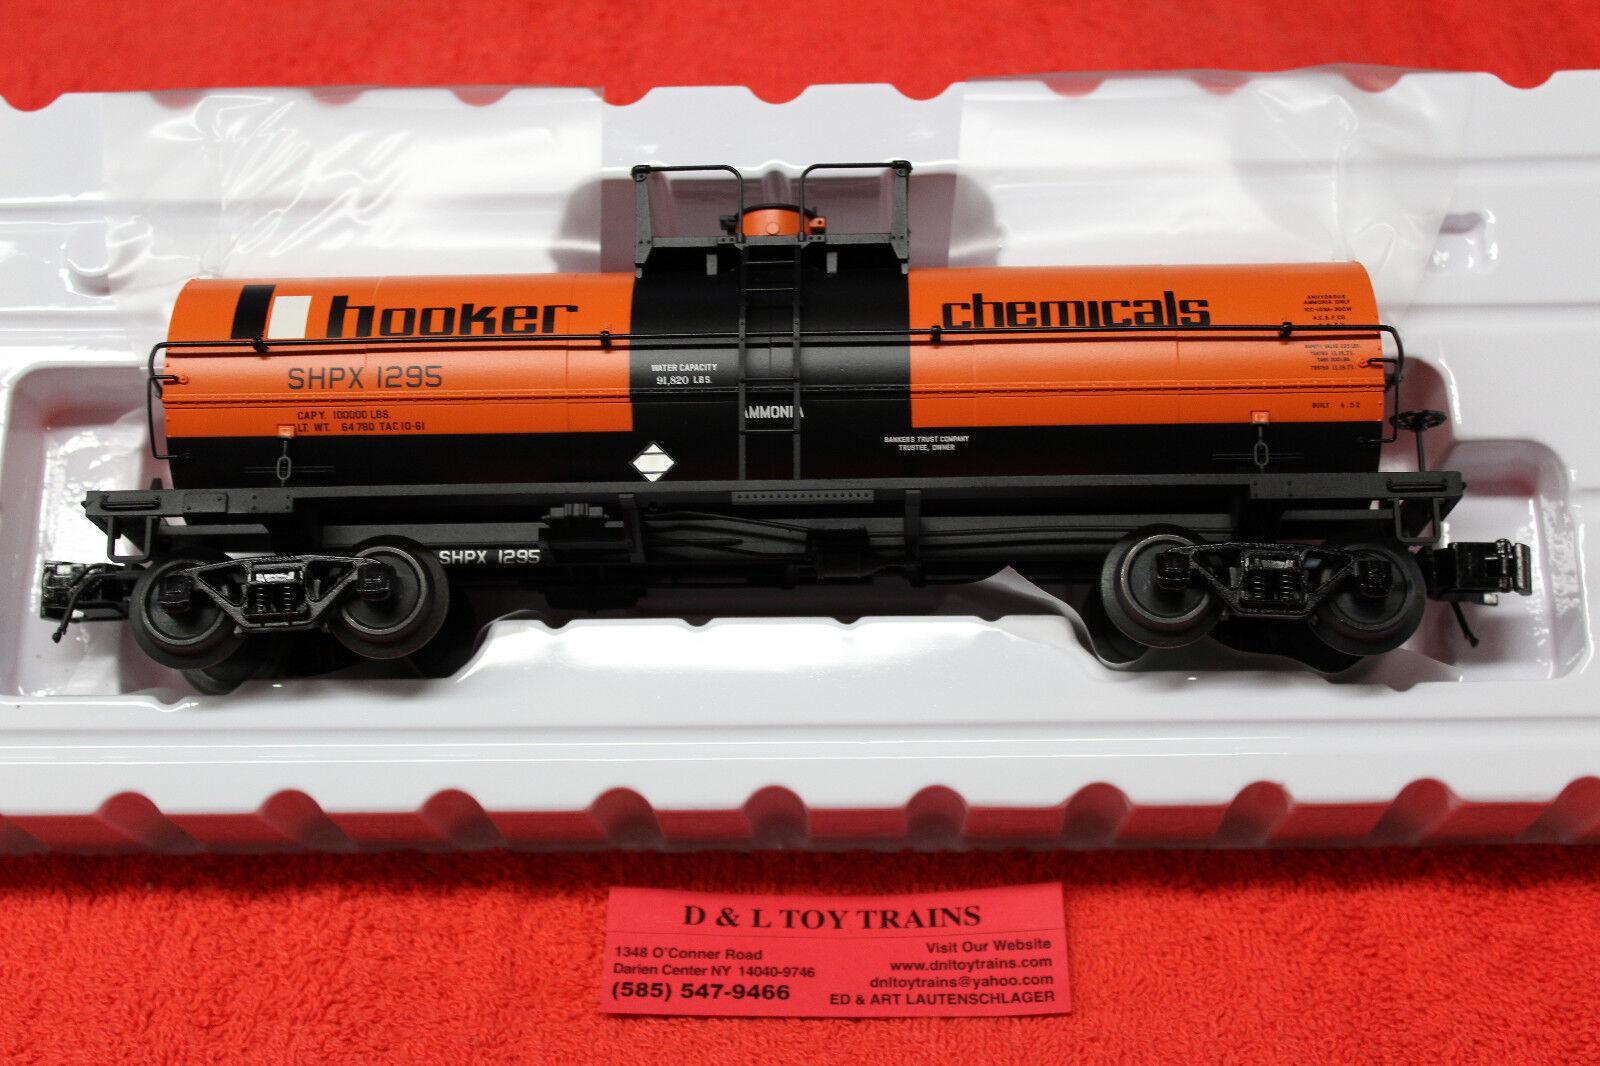 3005509 Hooker Chemical 11,000 Gallon Tank Car 3 Rail NEW IN BOX